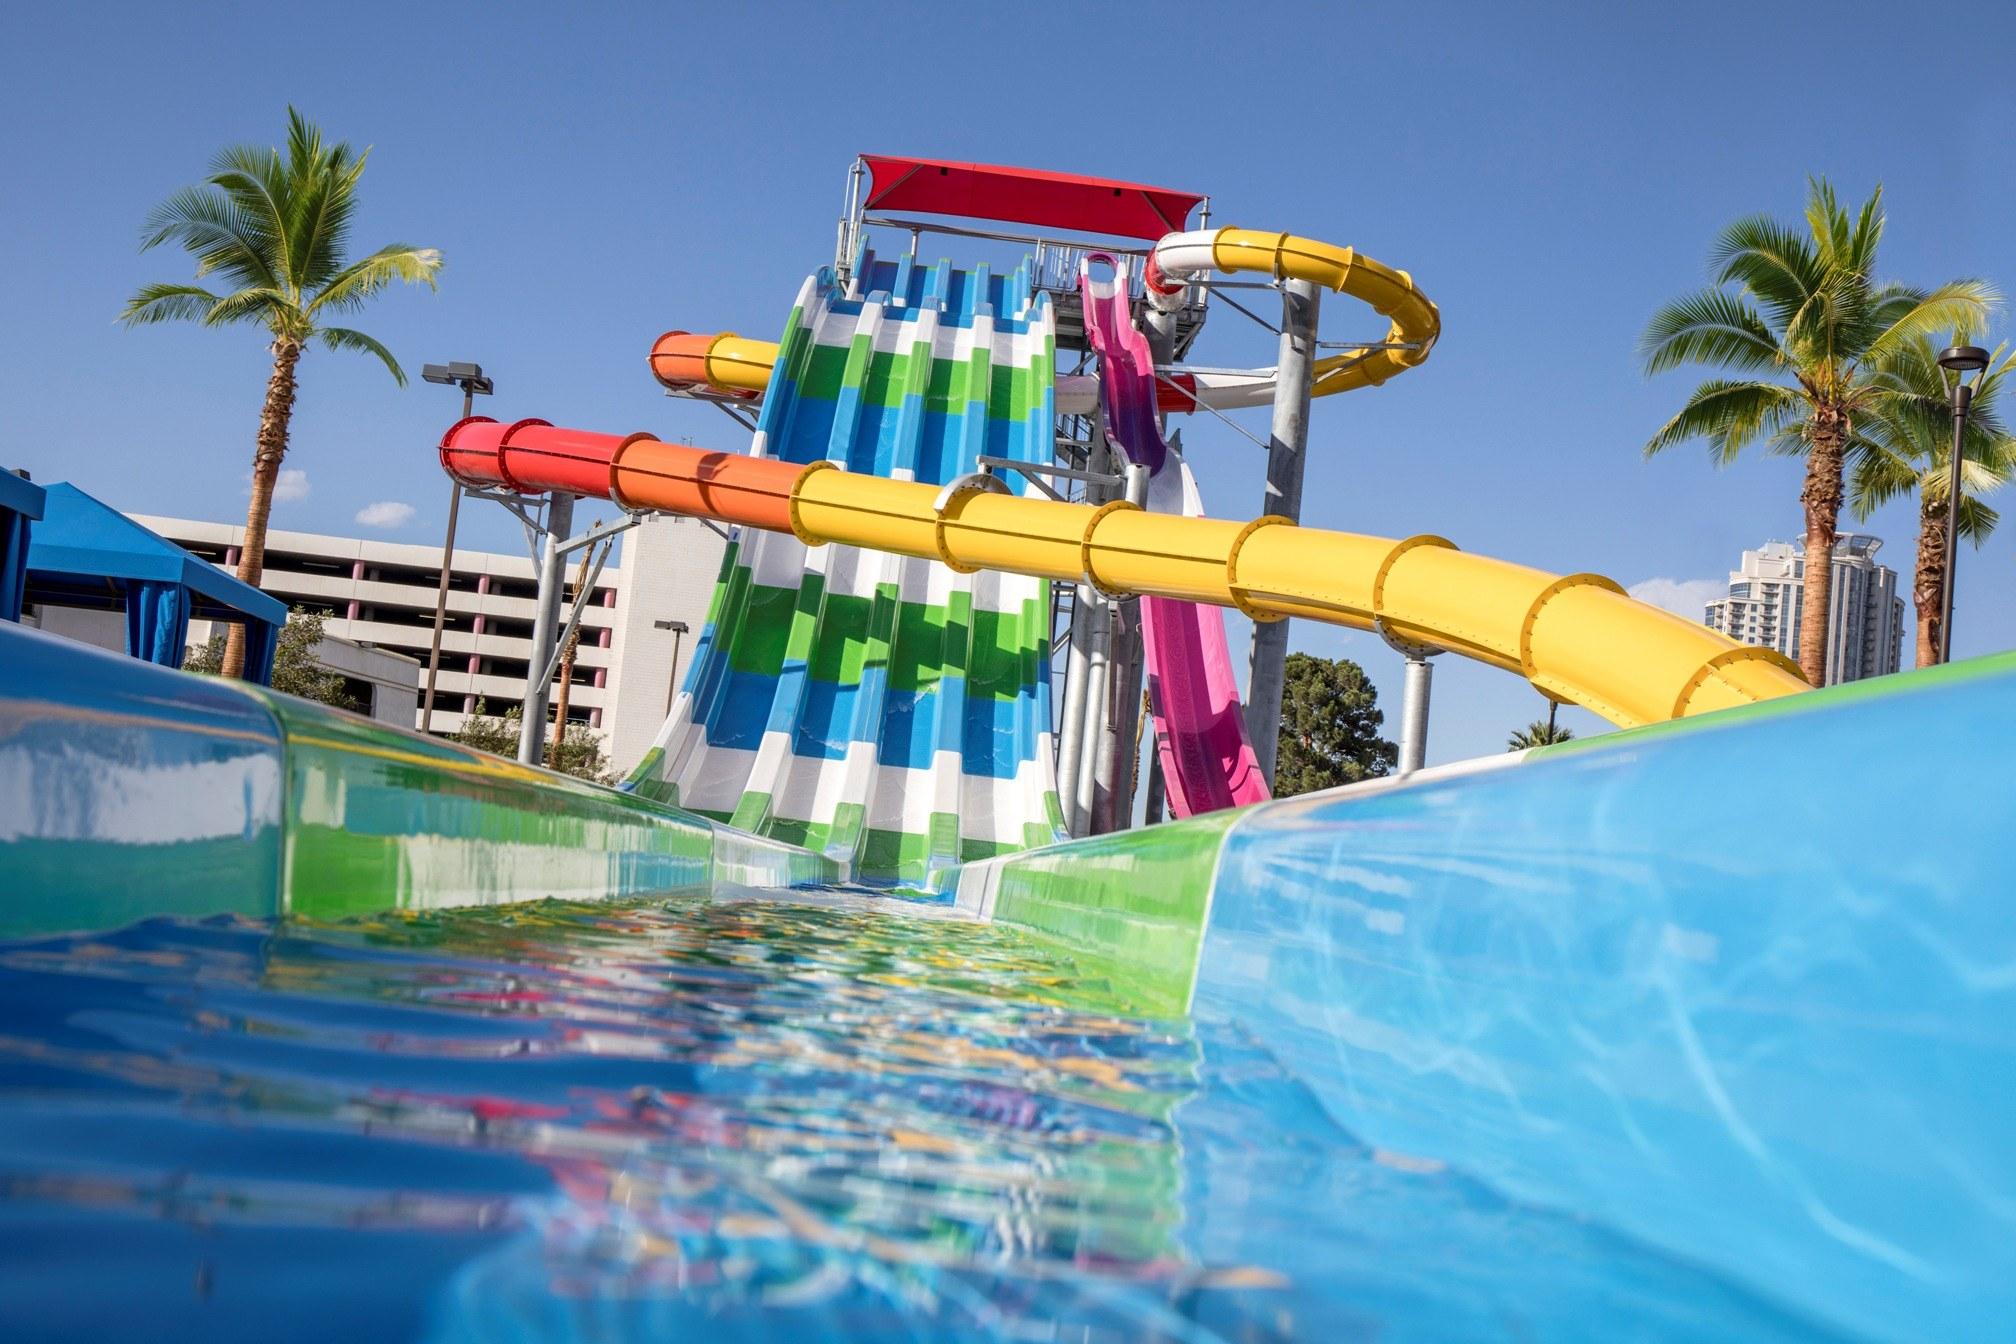 New Pool Splash Zone Experience At Circus Circus Las Vegas